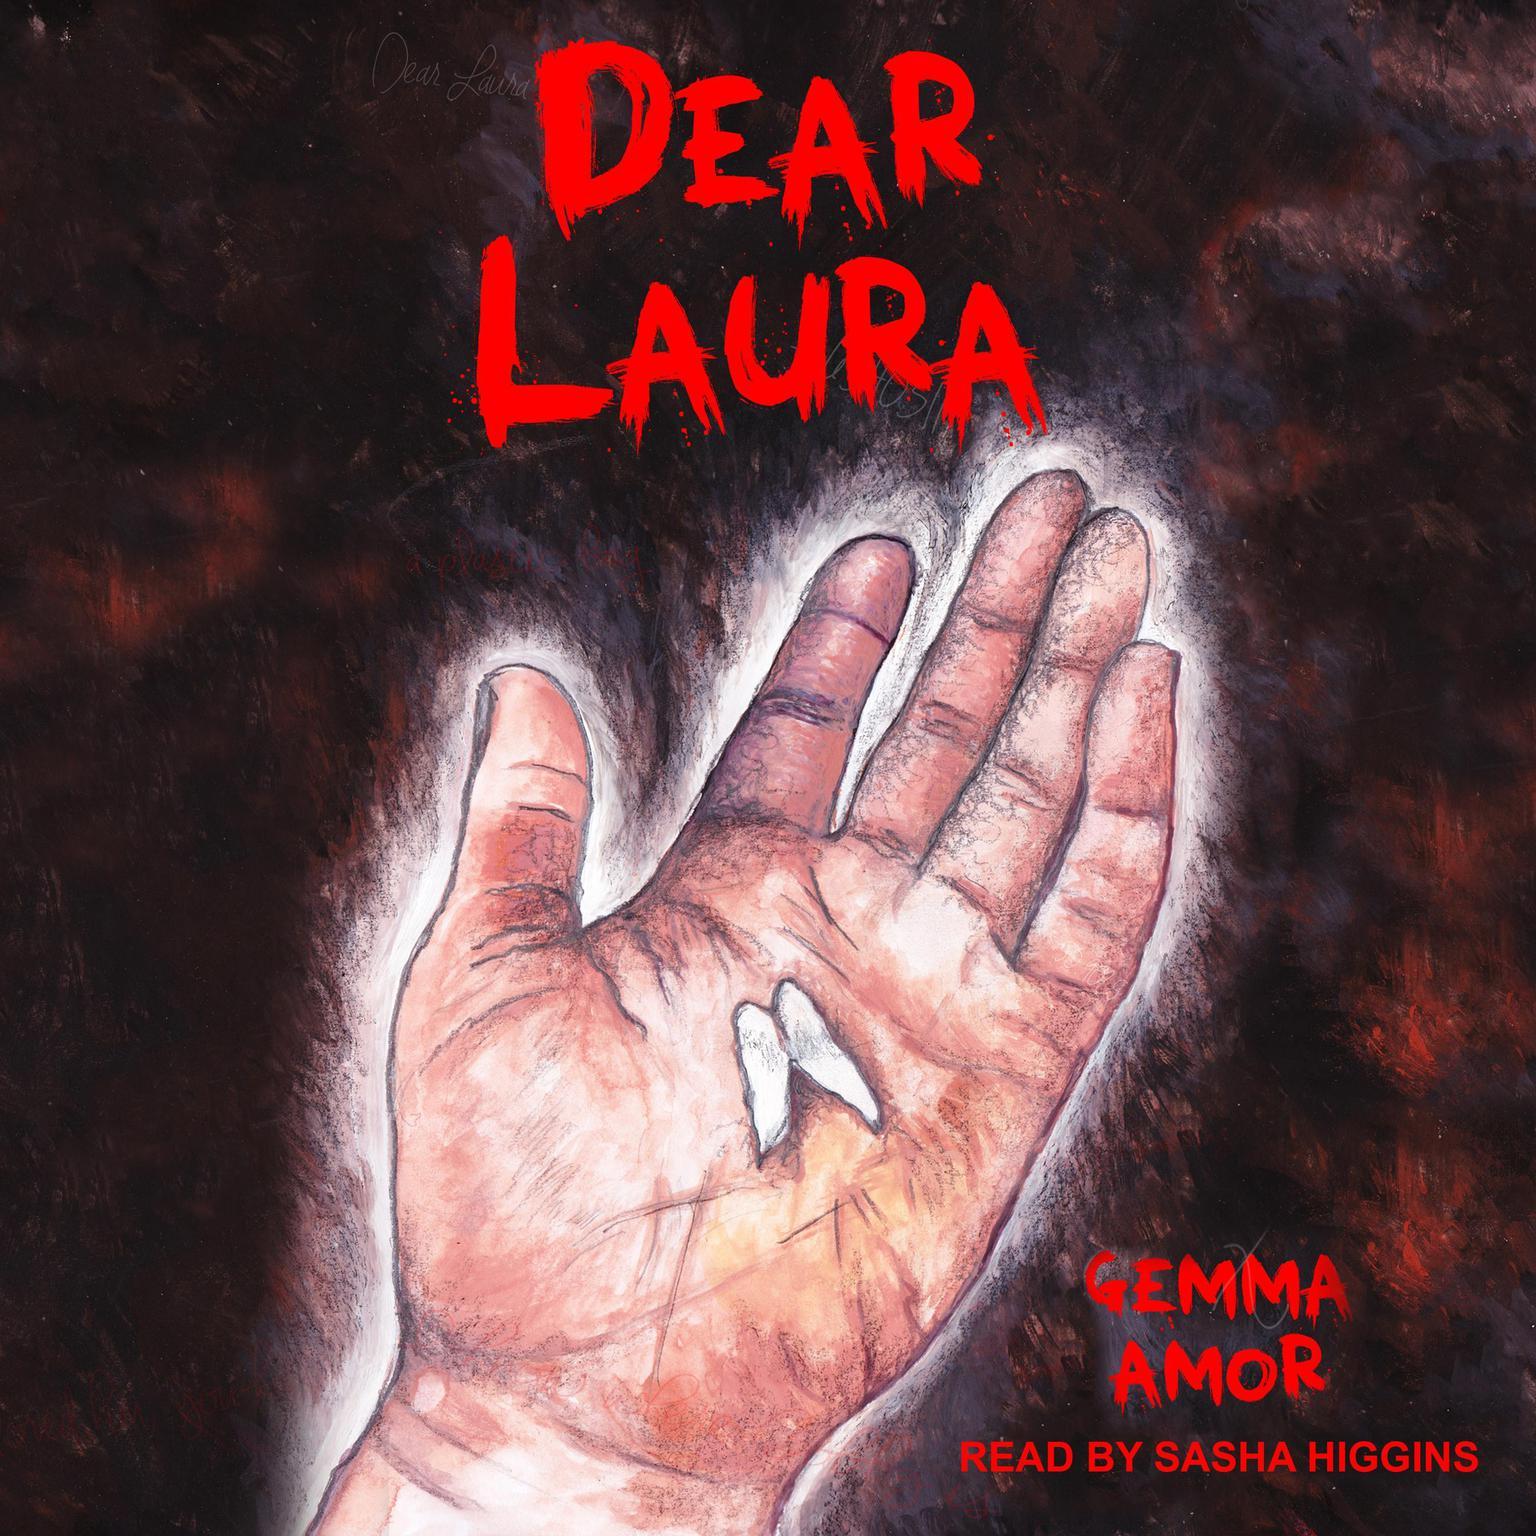 Dear Laura Audiobook, by Gemma Amor